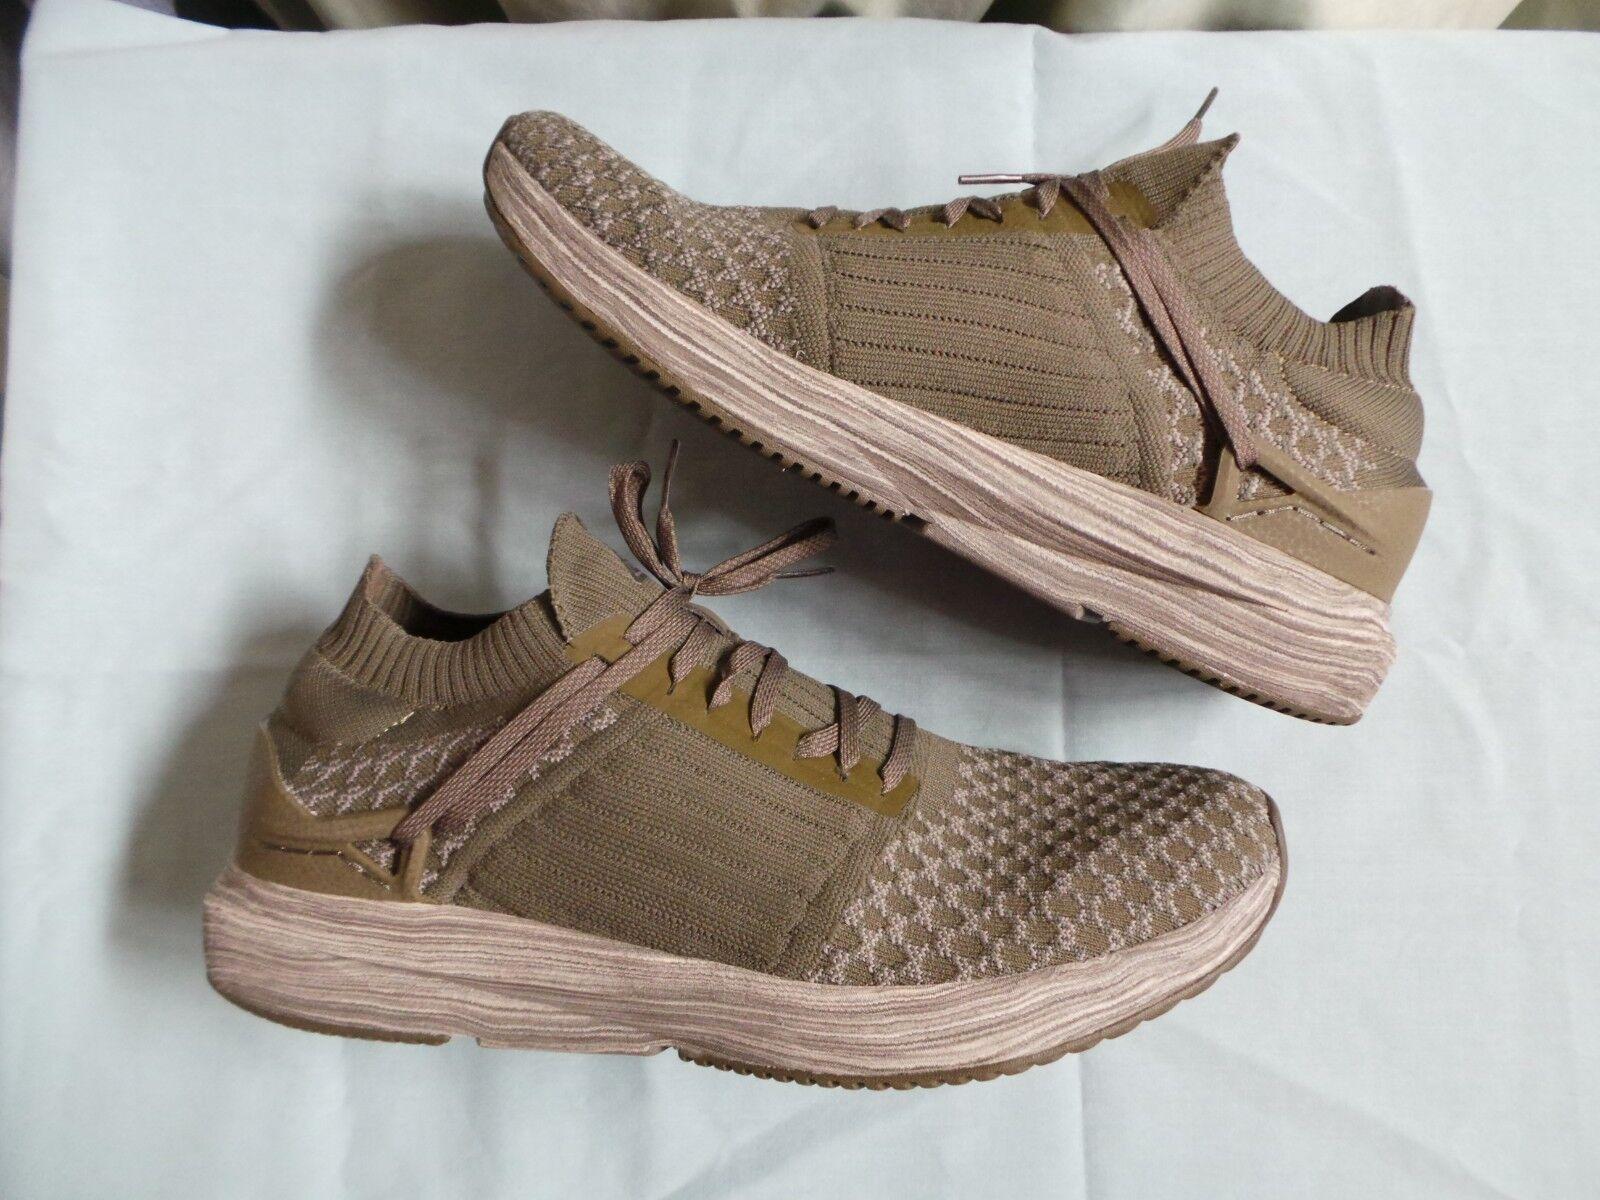 BrandBlack Brand Black Viento running shoe knit comfortable rare s 11 DS NEW NIB